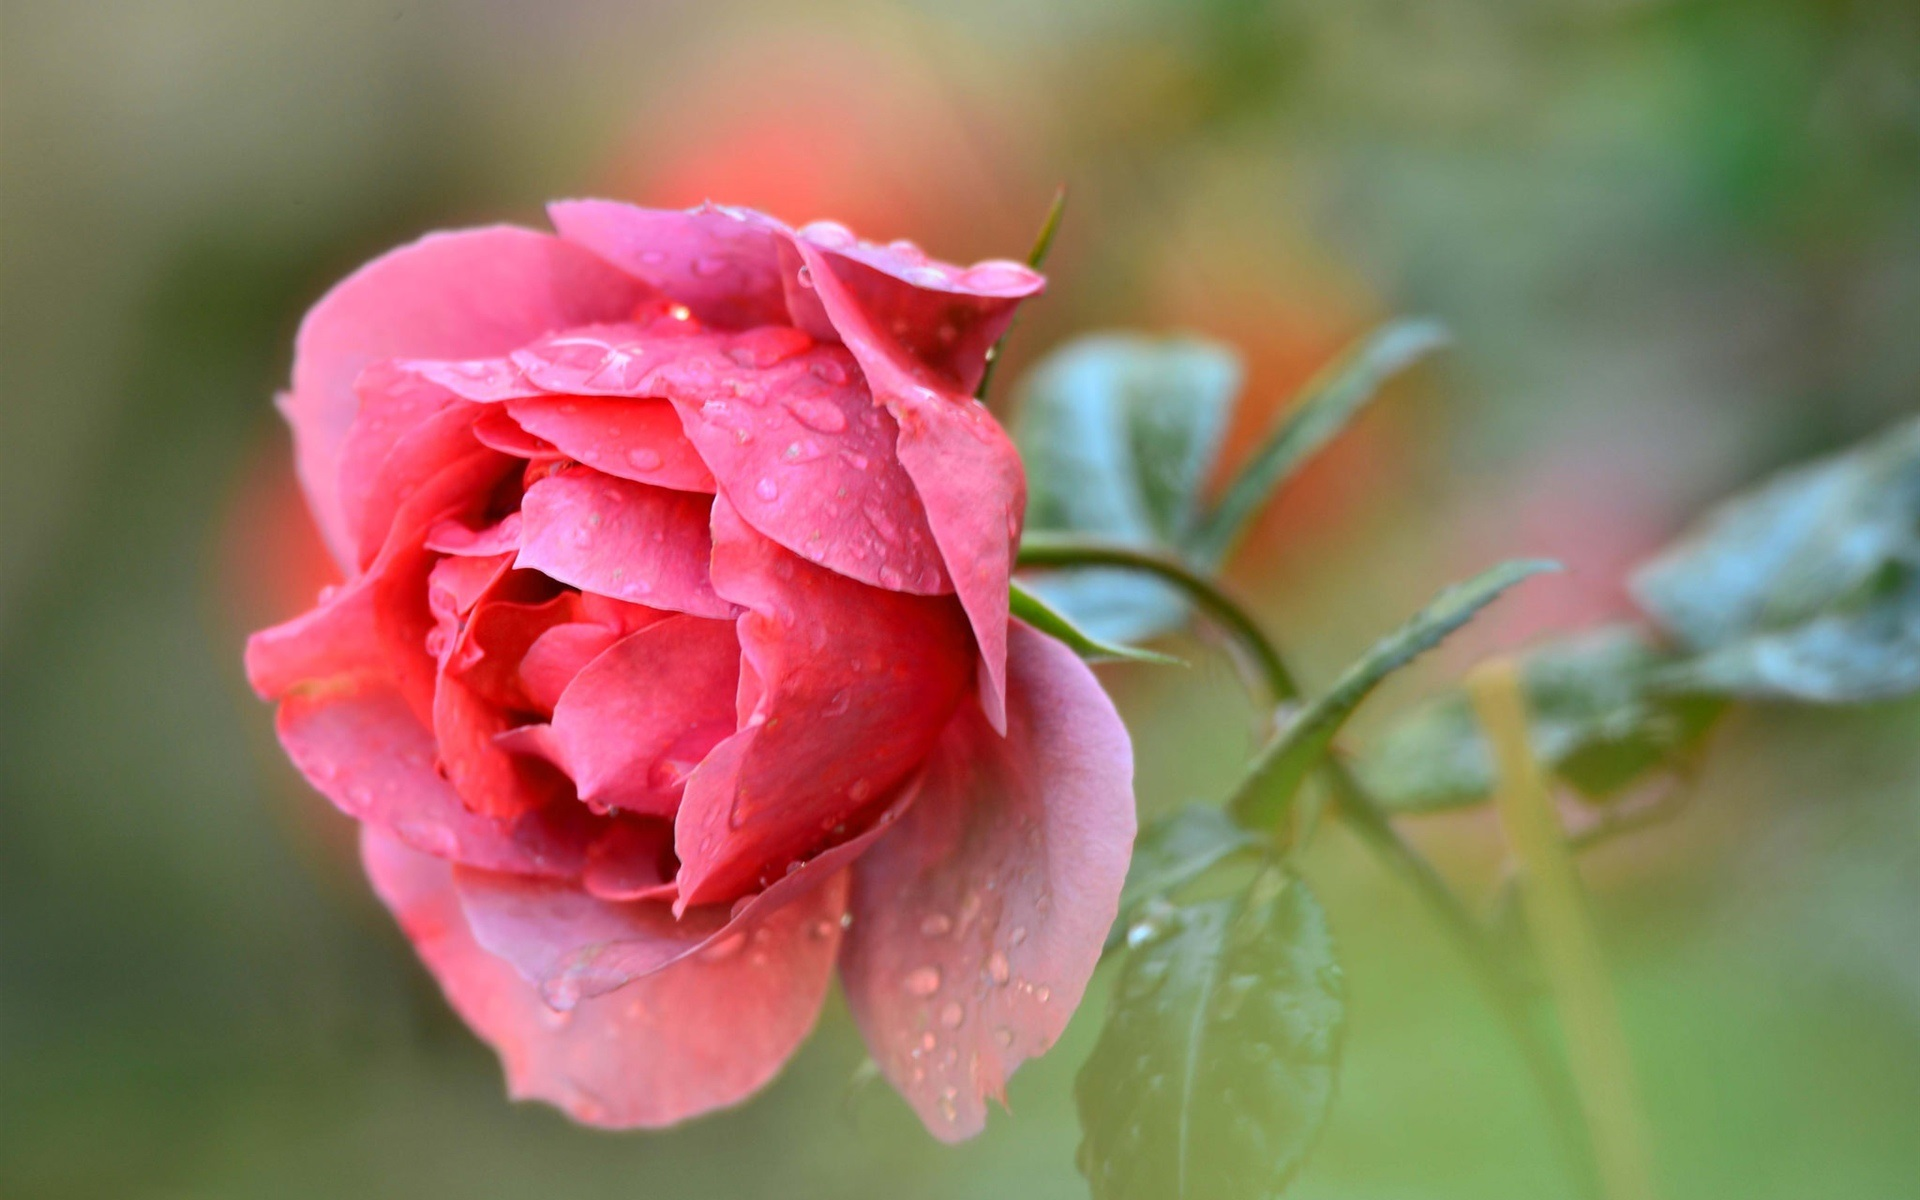 Single Rose Wallpapers: Wallpaper Single Red Rose Flower, Water Drops 1920x1200 HD